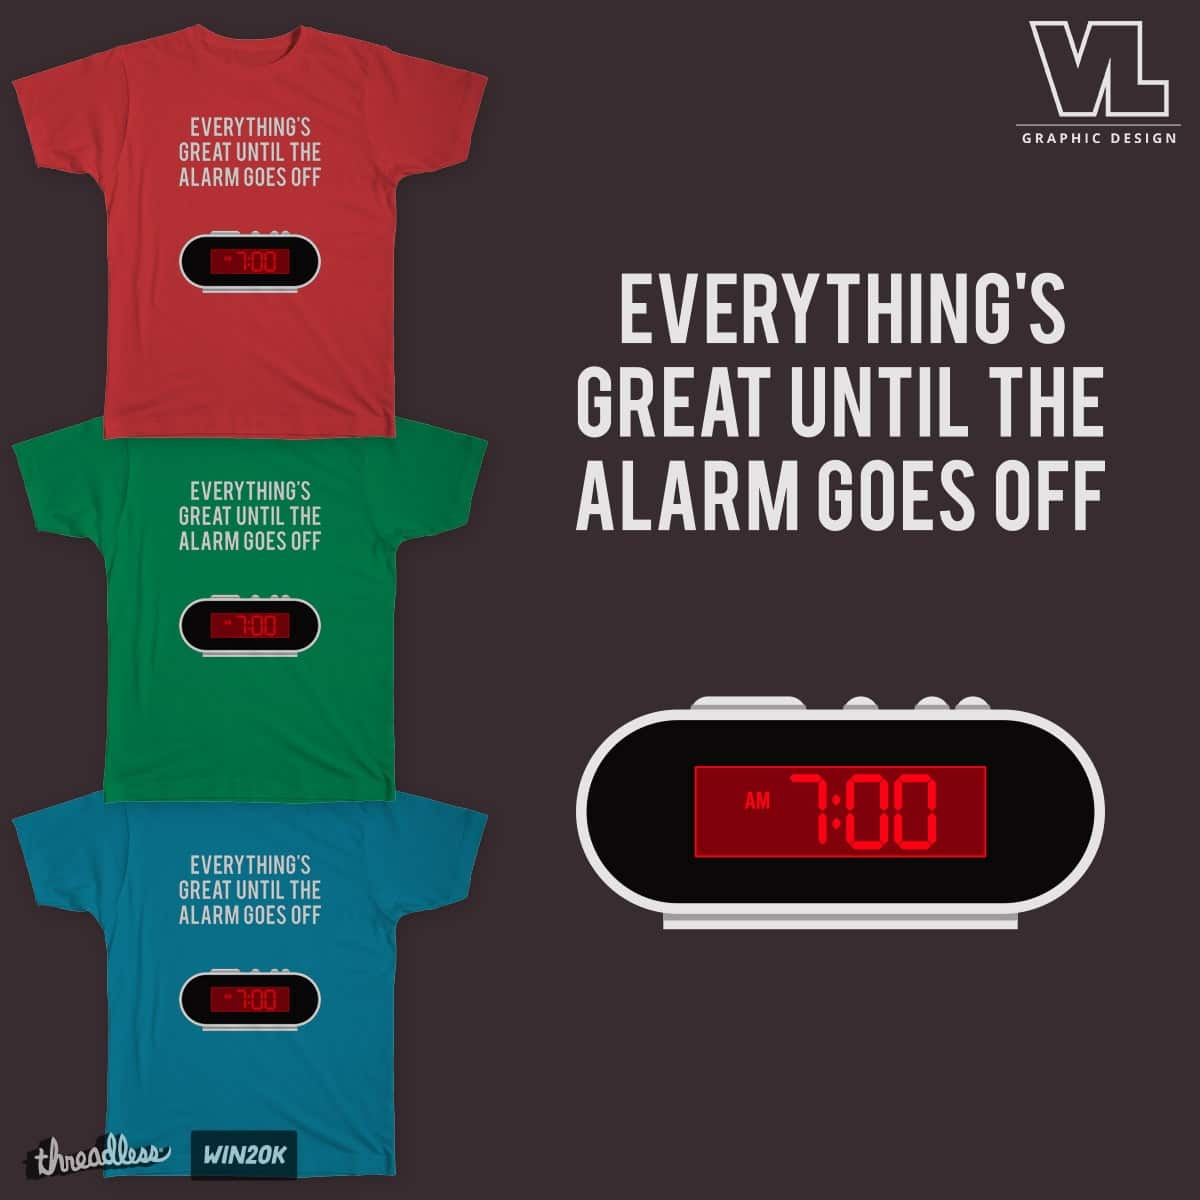 7 AM by vectoredlife on Threadless